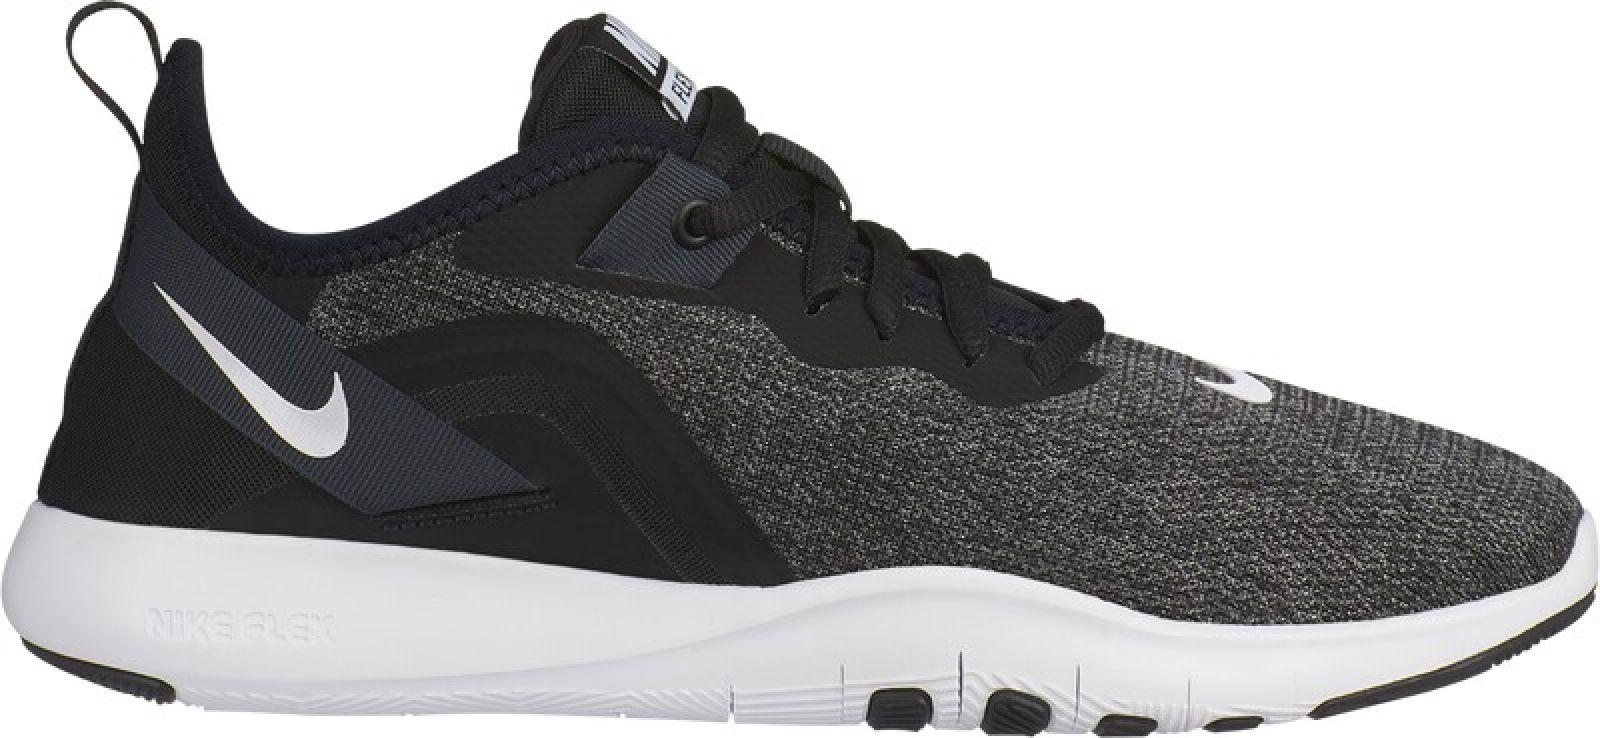 Trainer Original Training 9 Grey Details Title Fitness Show About Womens Wmns Black Sport Nike Shoes Flex w8m0Nn